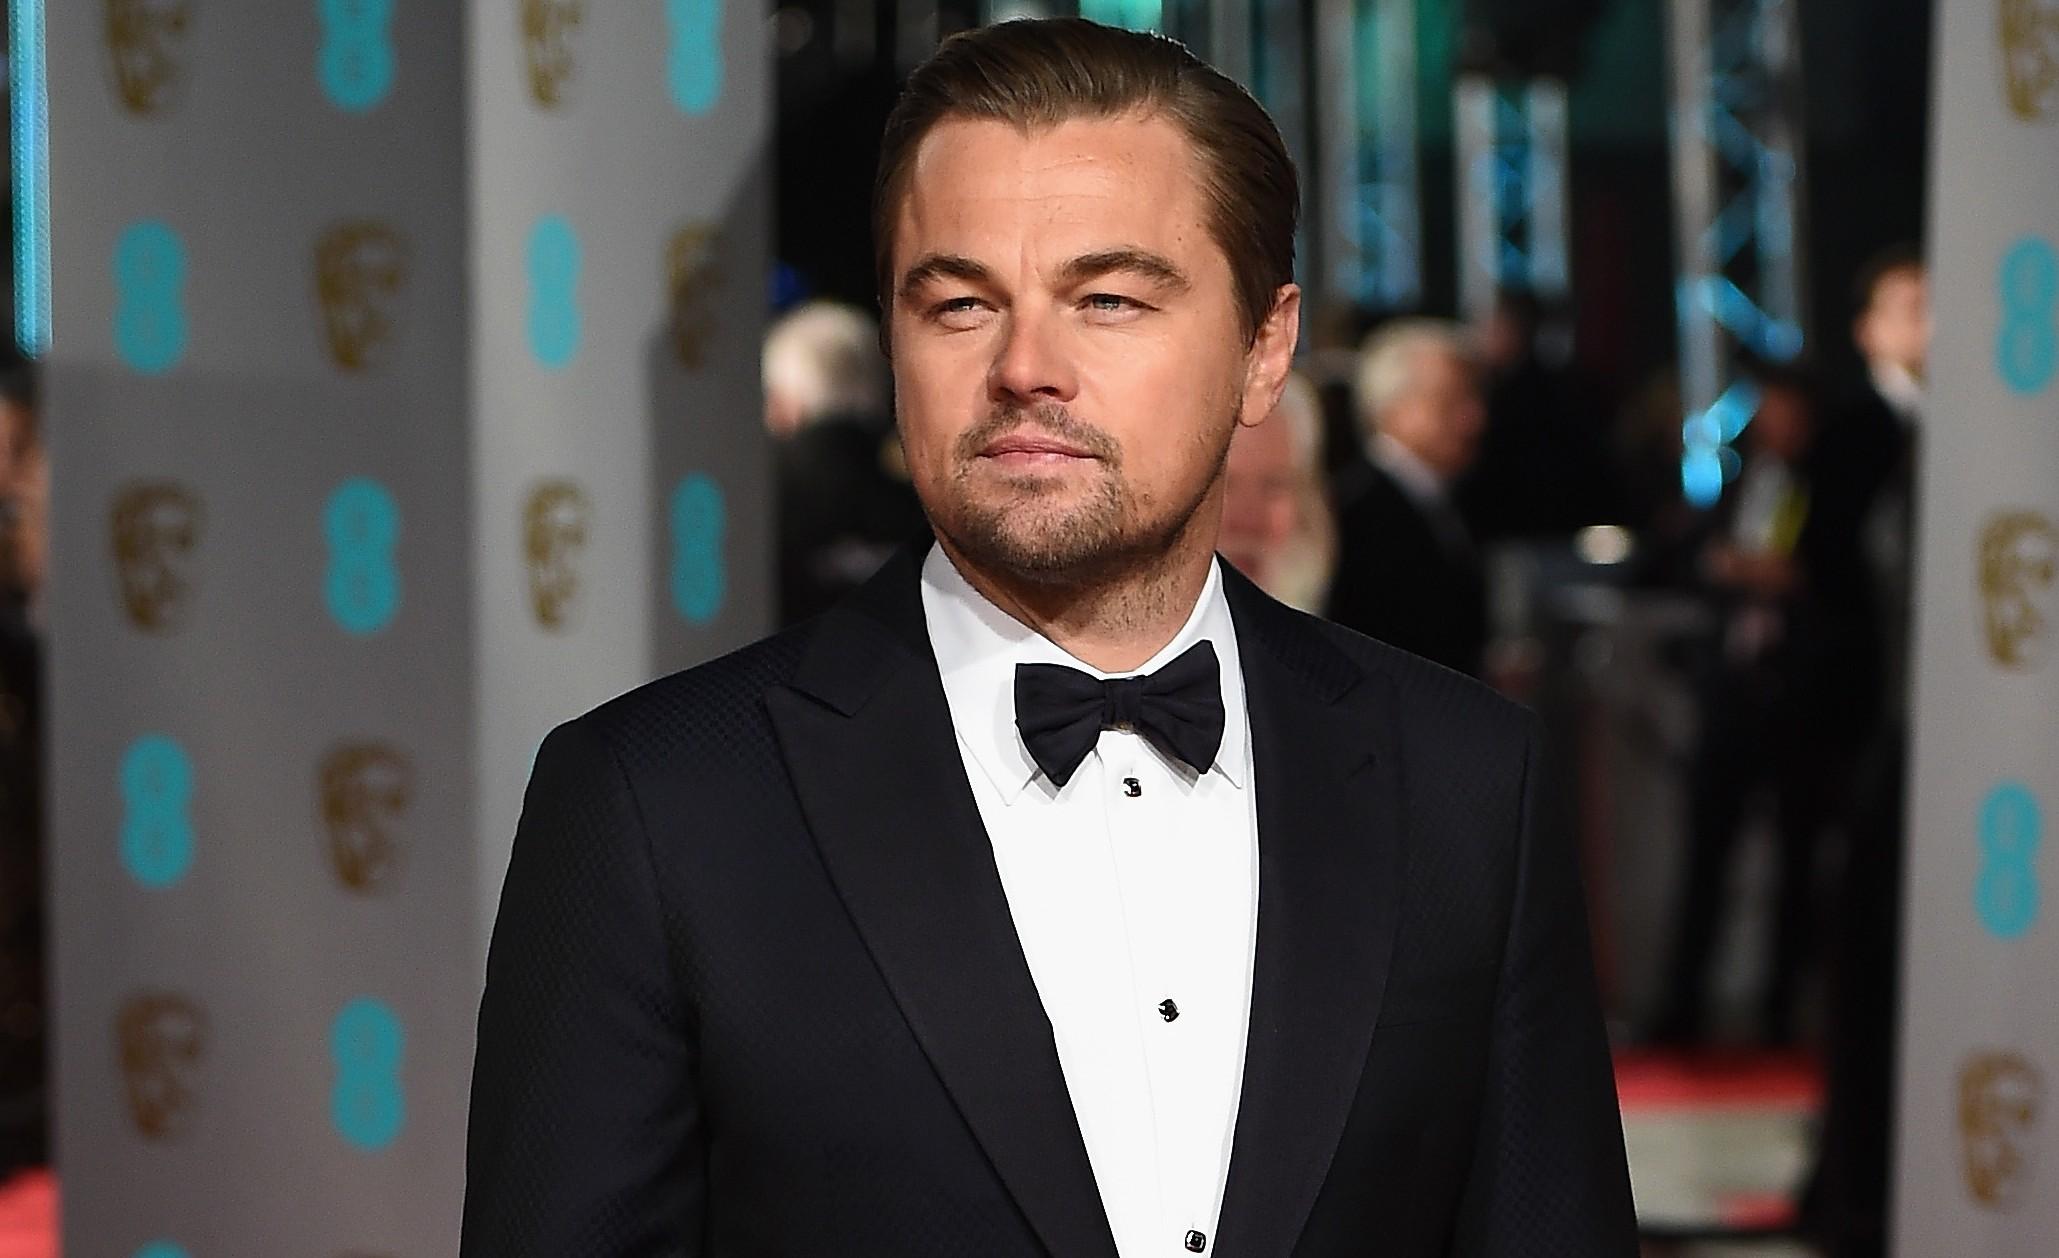 Surely it must be Leo's year? (Ian Gavan/Getty Images)